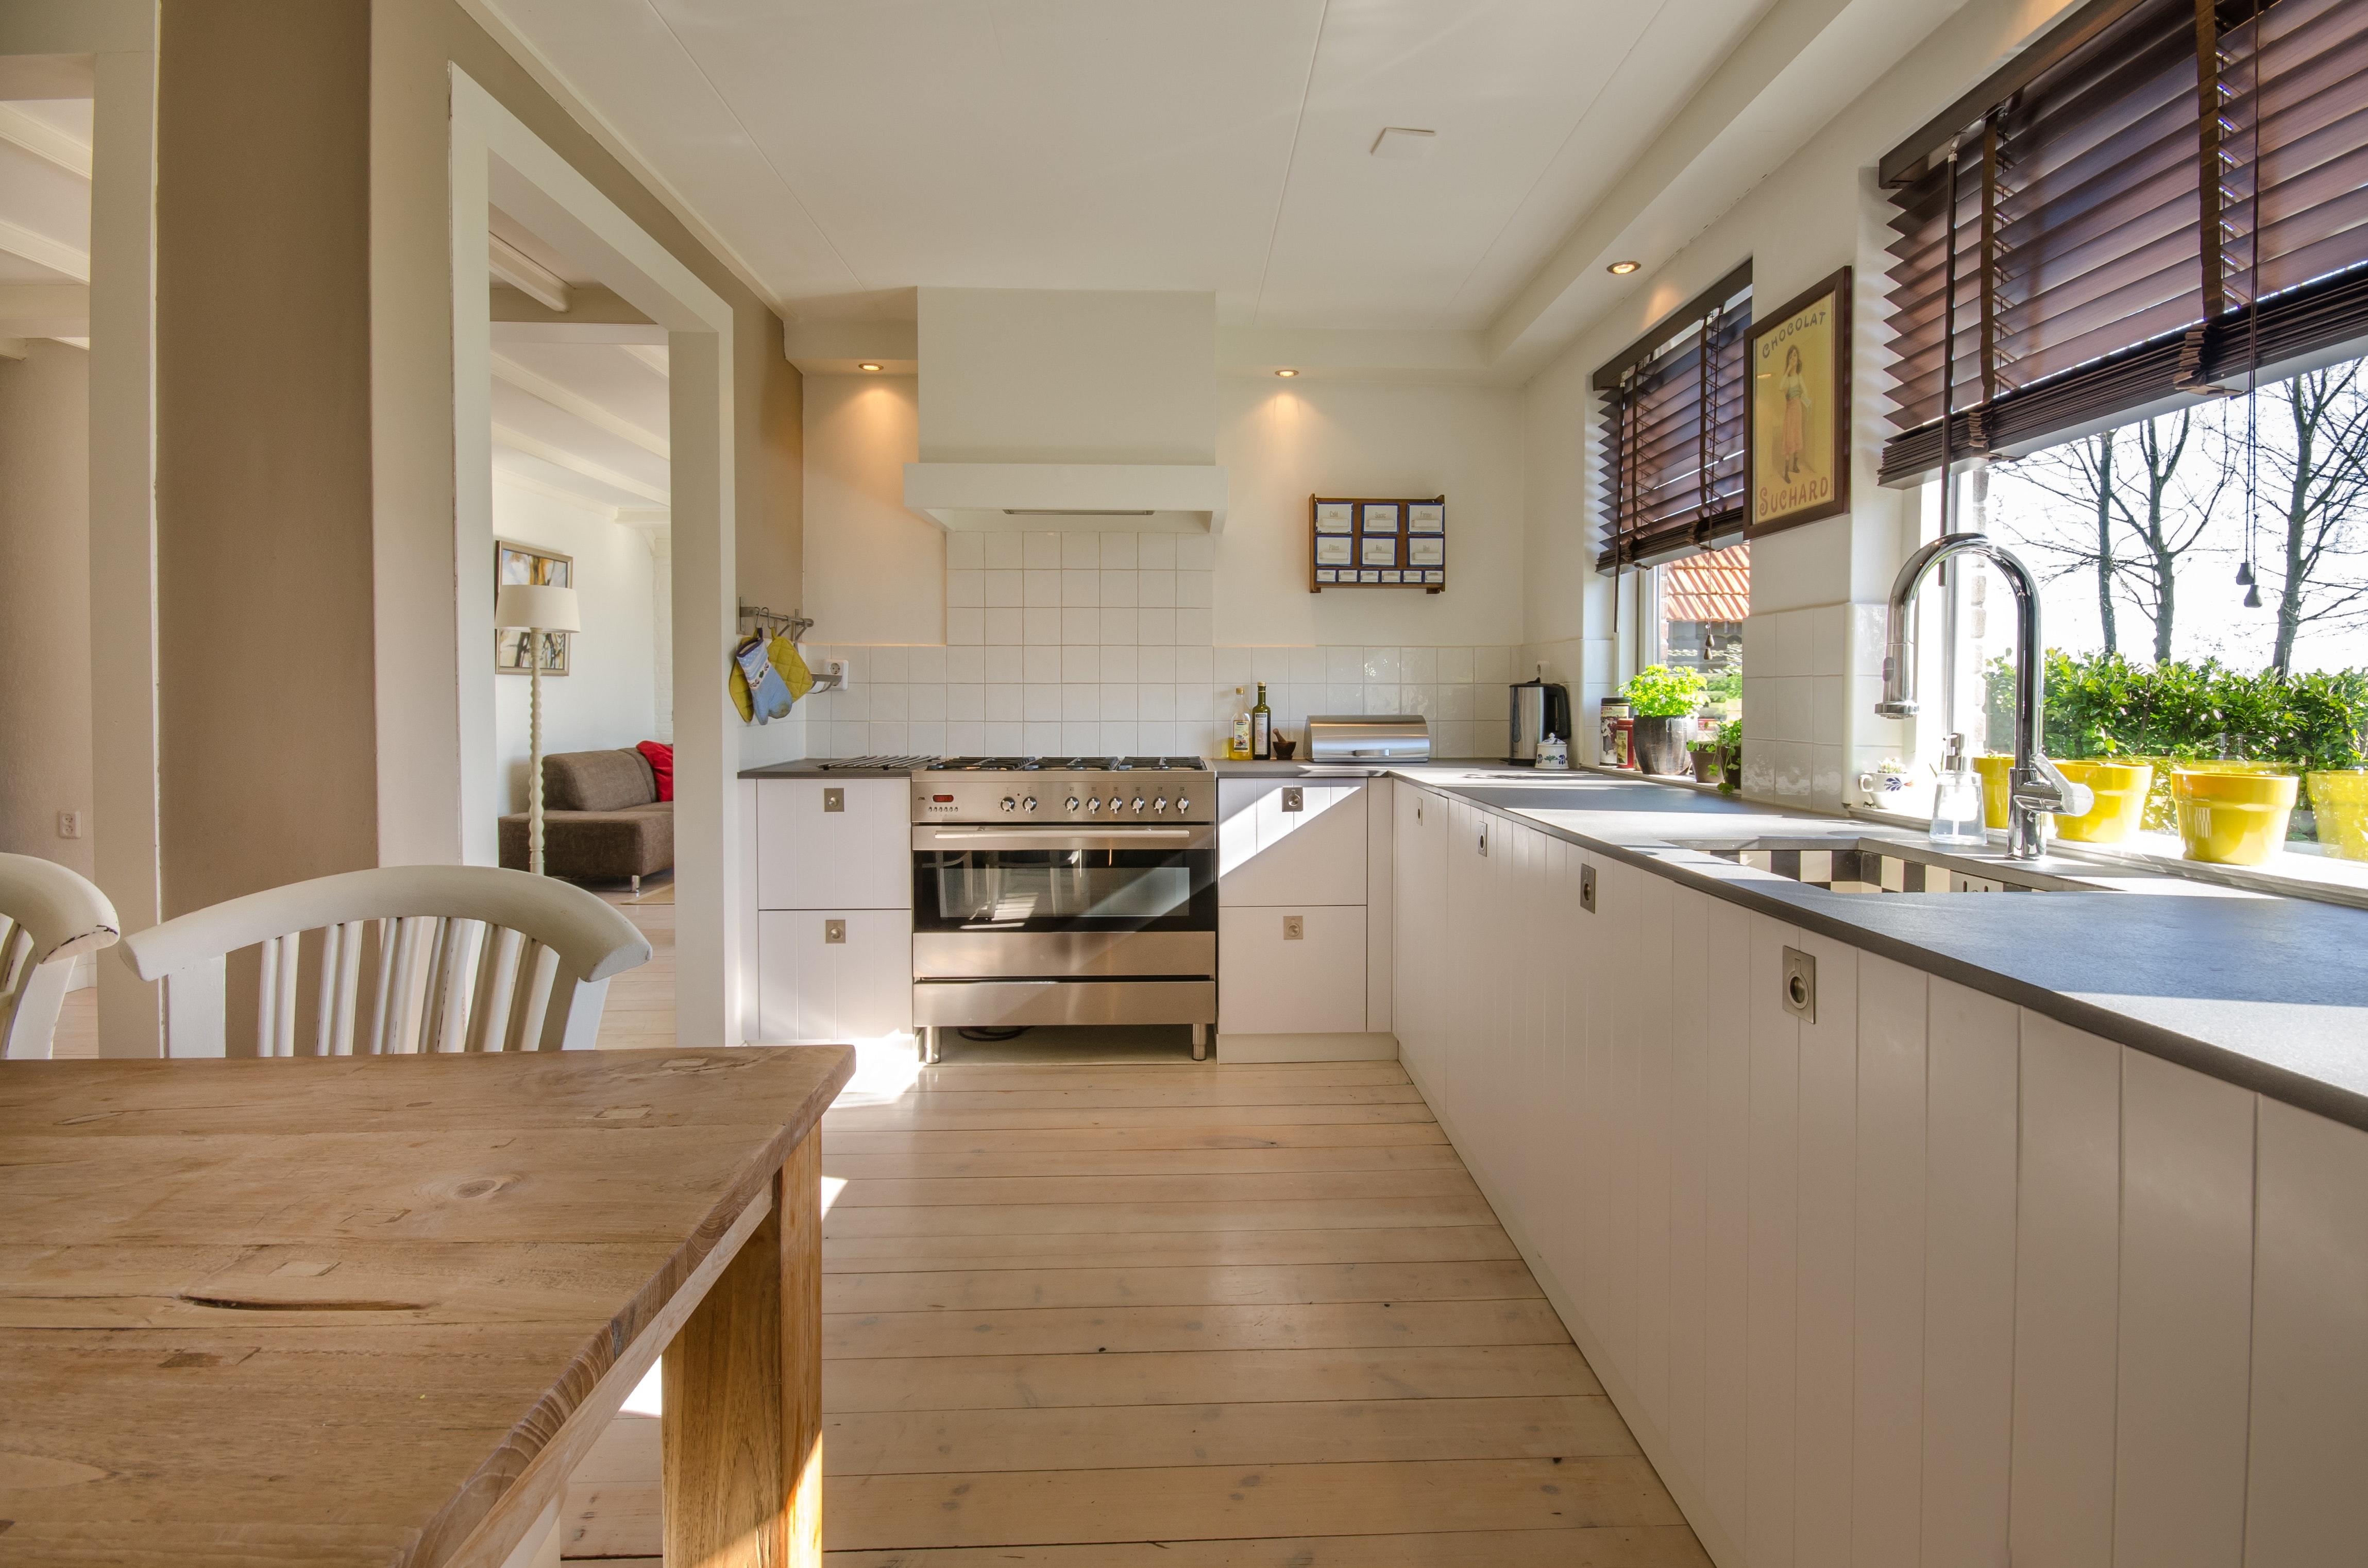 Amazing 1000+ Engaging Kitchen Design Queenstown Photos · Pexels · Free Stock Photos